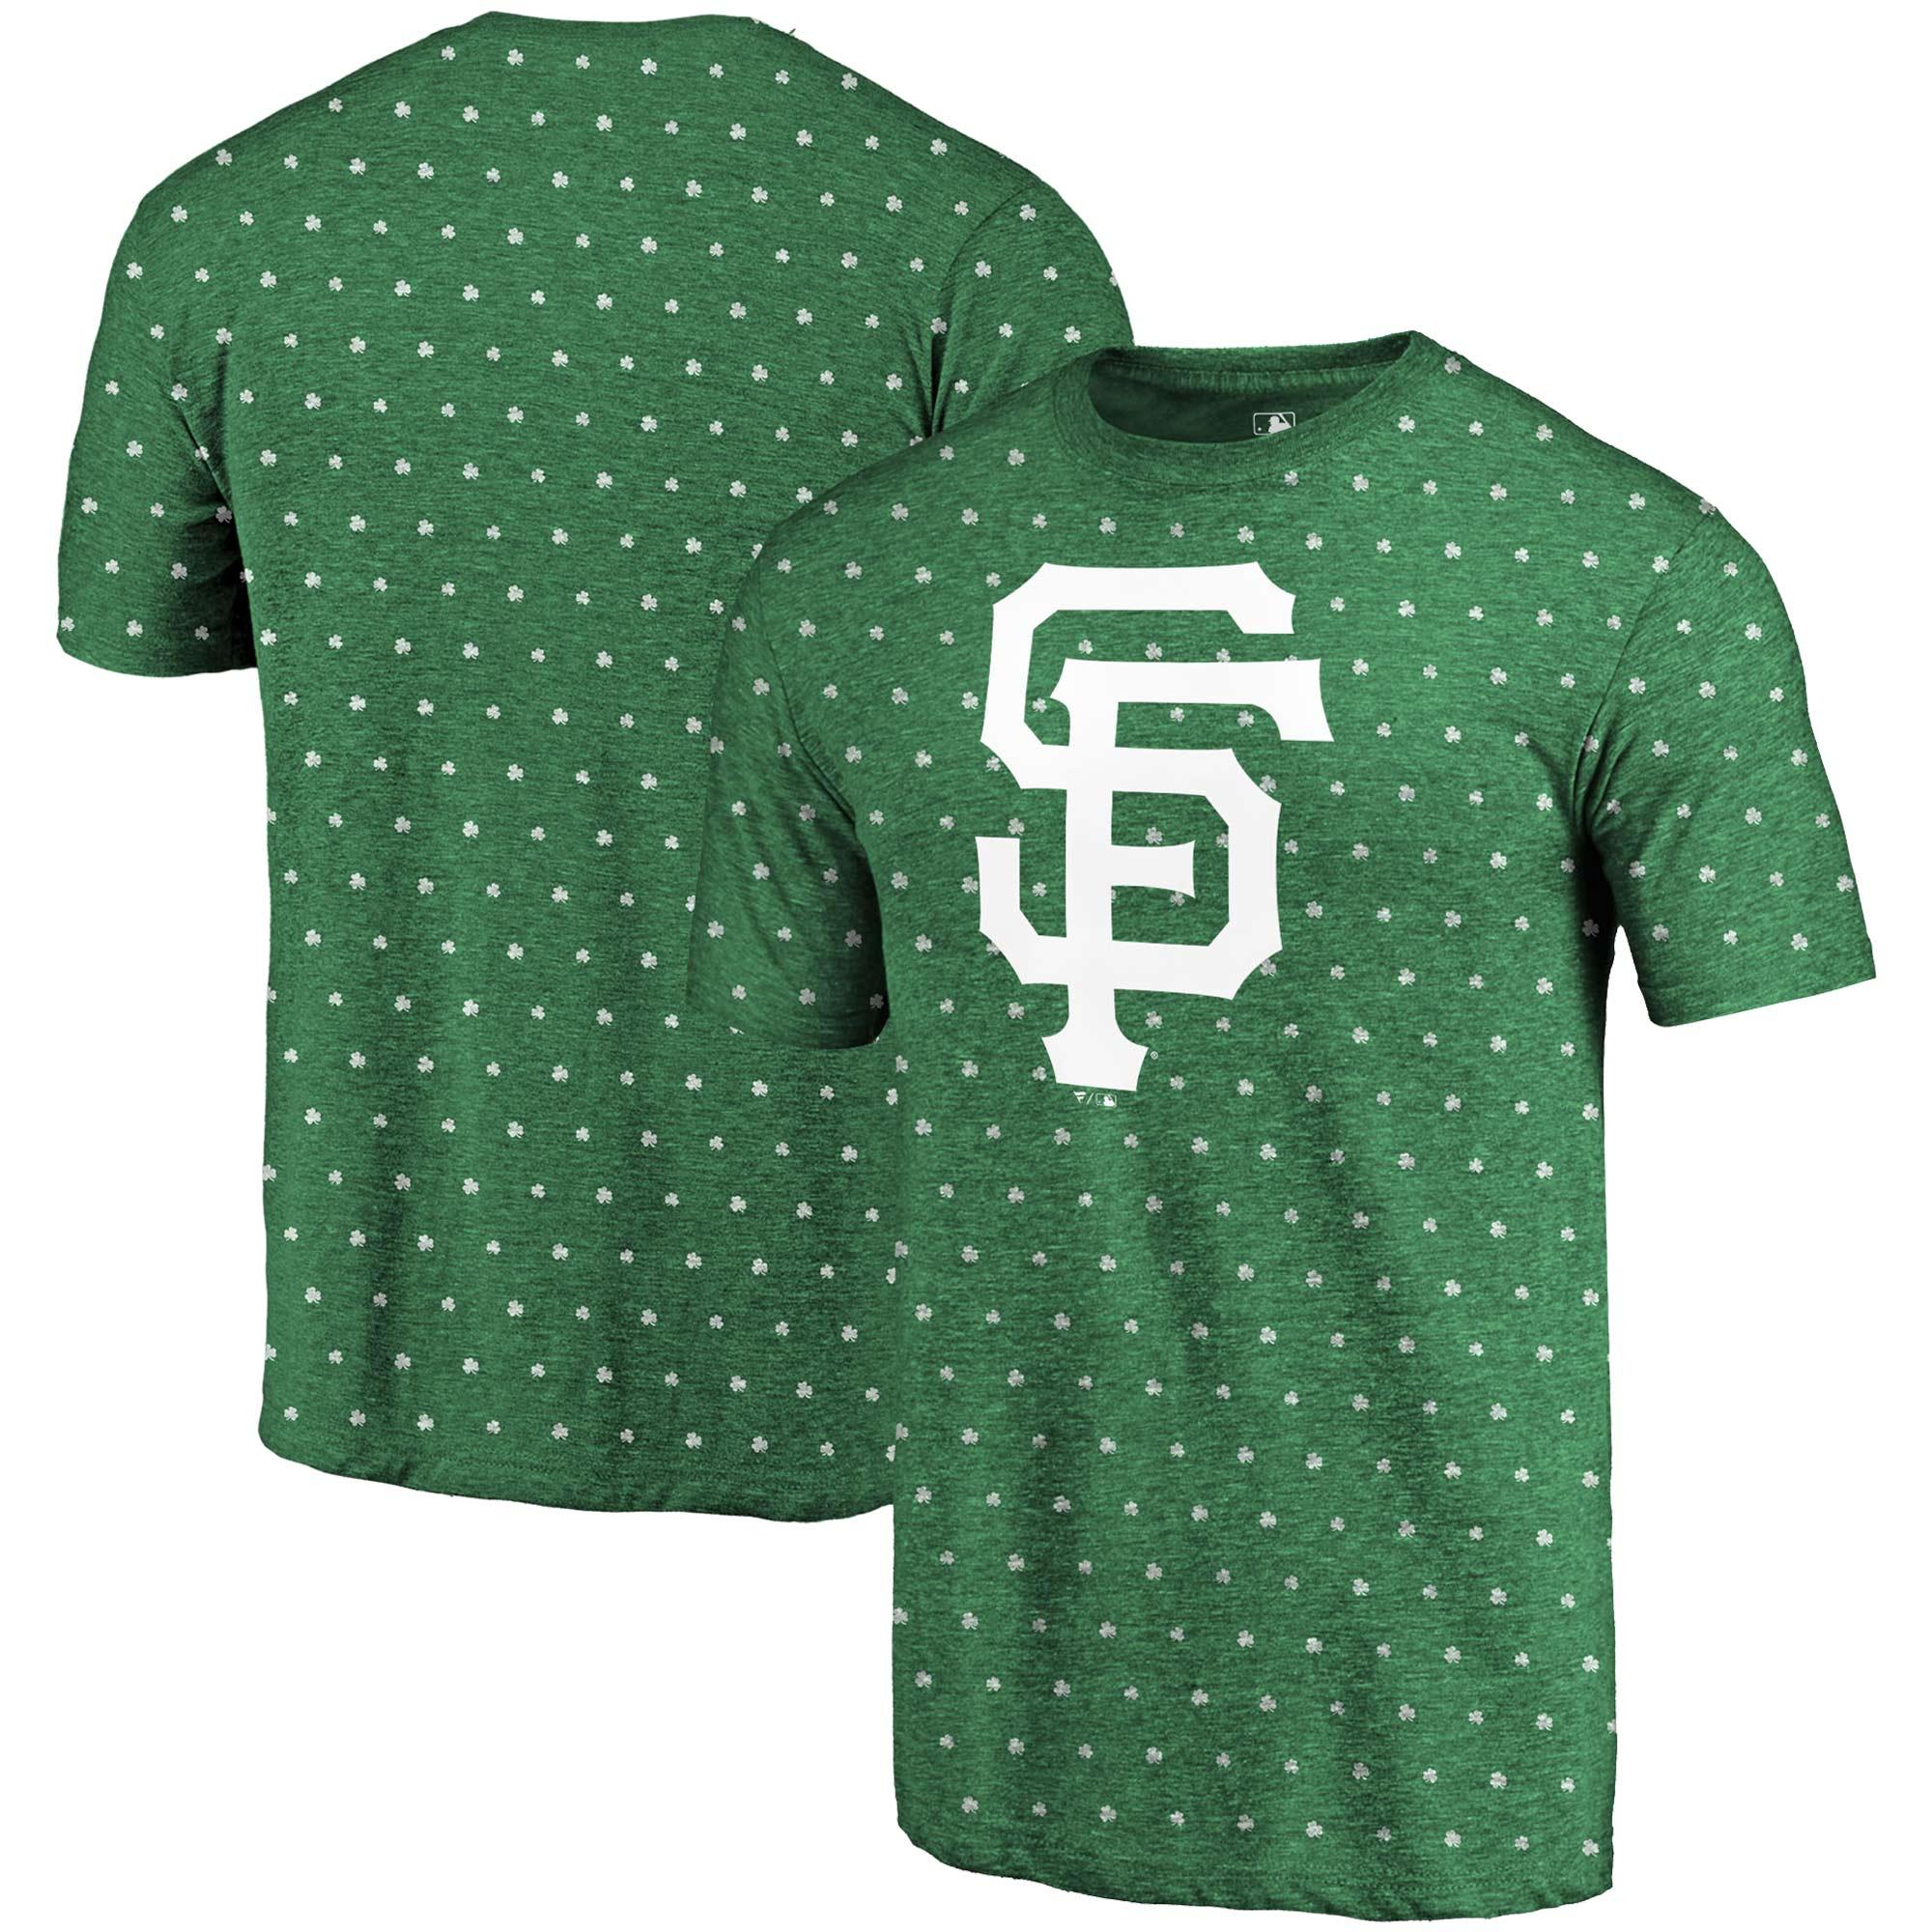 San Francisco Giants Fanatics Branded 2018 St. Patrick's Day All Irish Tri-Blend T-Shirt - Kelly Green